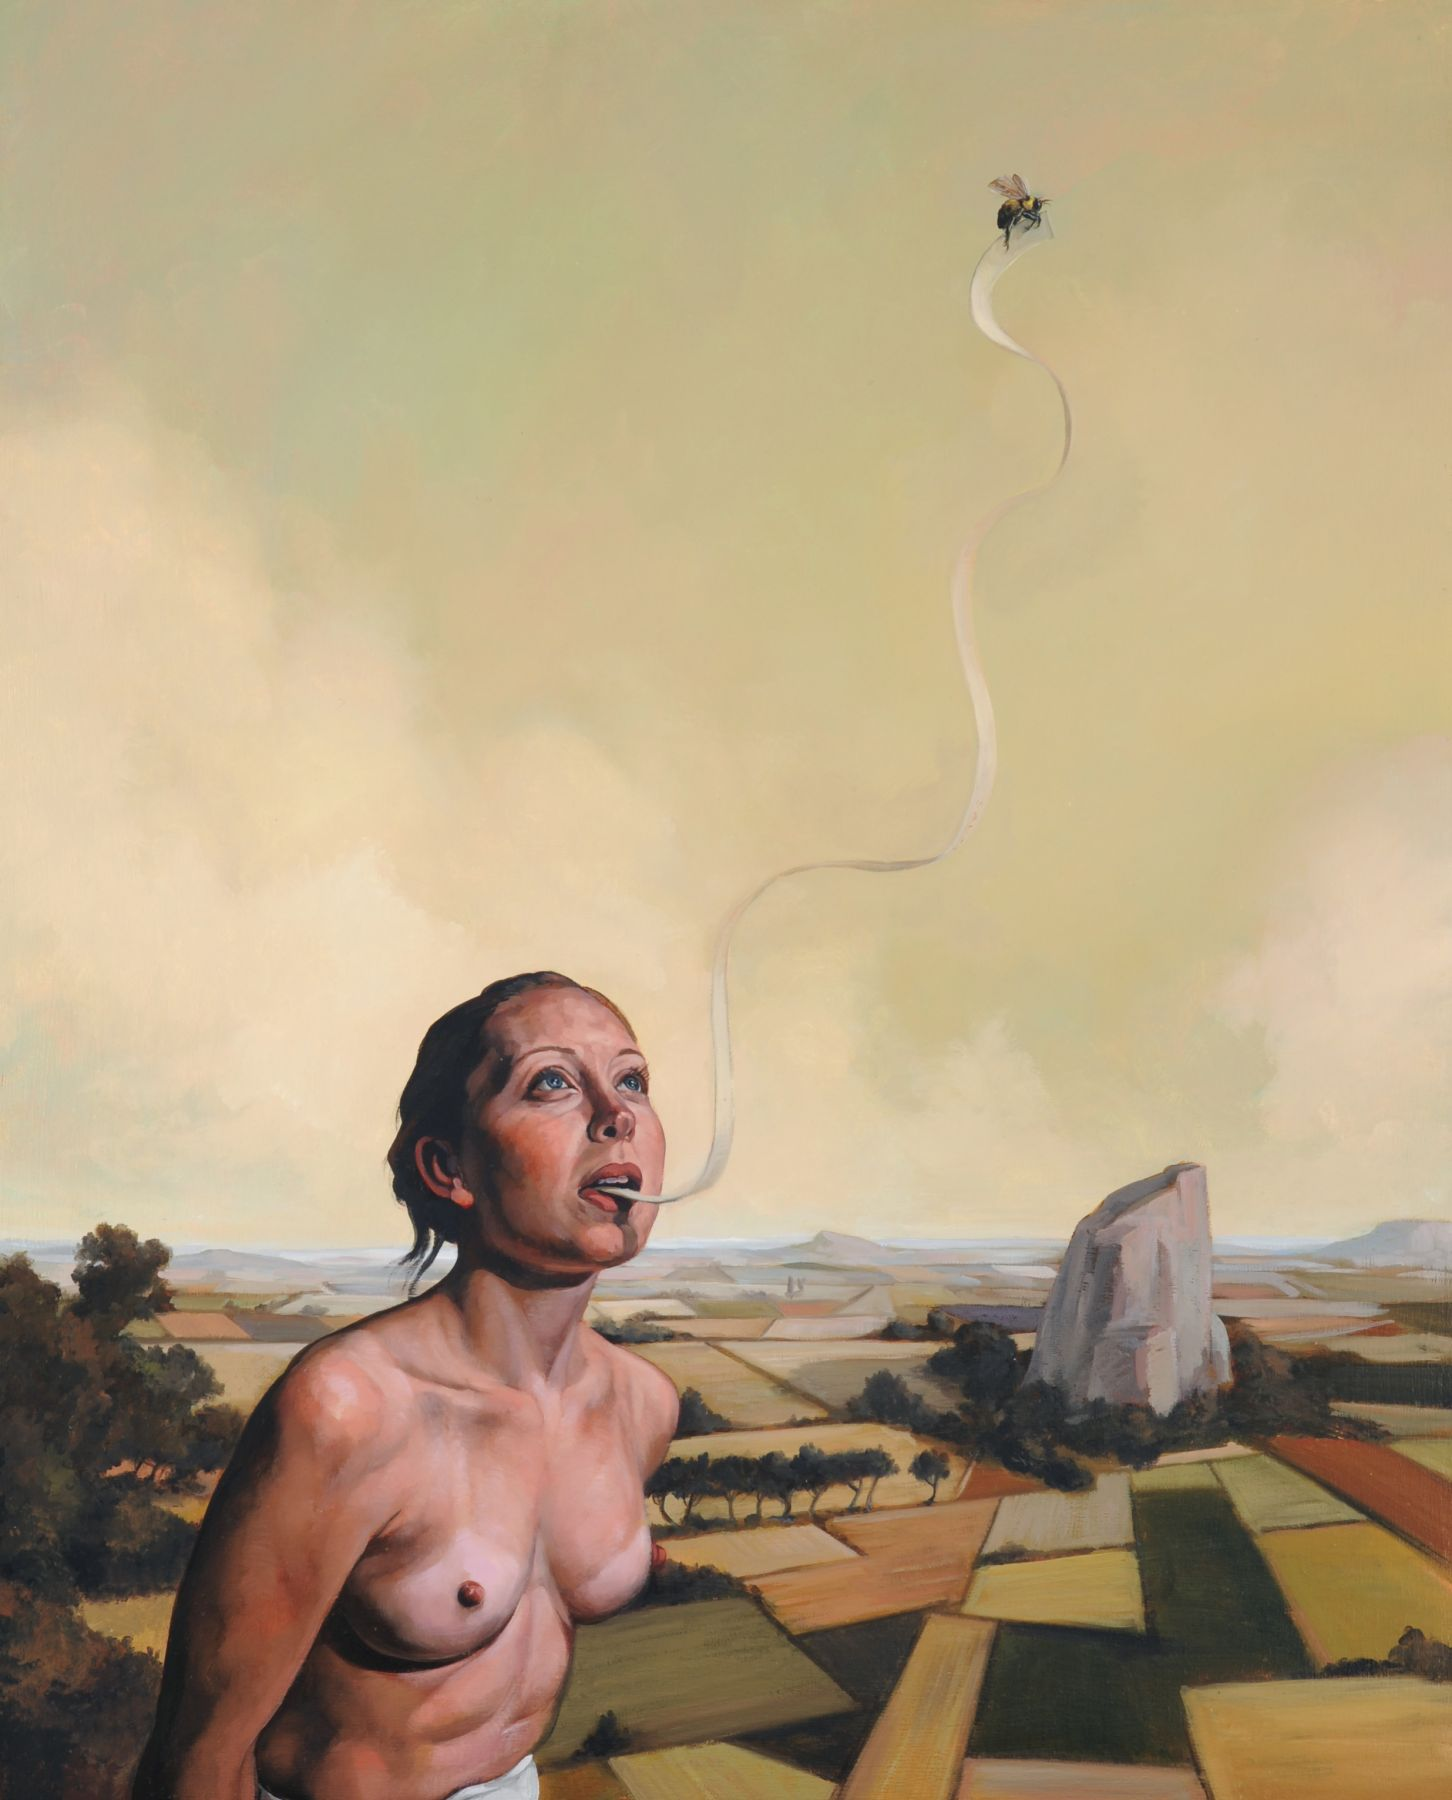 ERIK THOR SANDBERG Eloquence 2009, oil on canvas, 30 x 24 inches